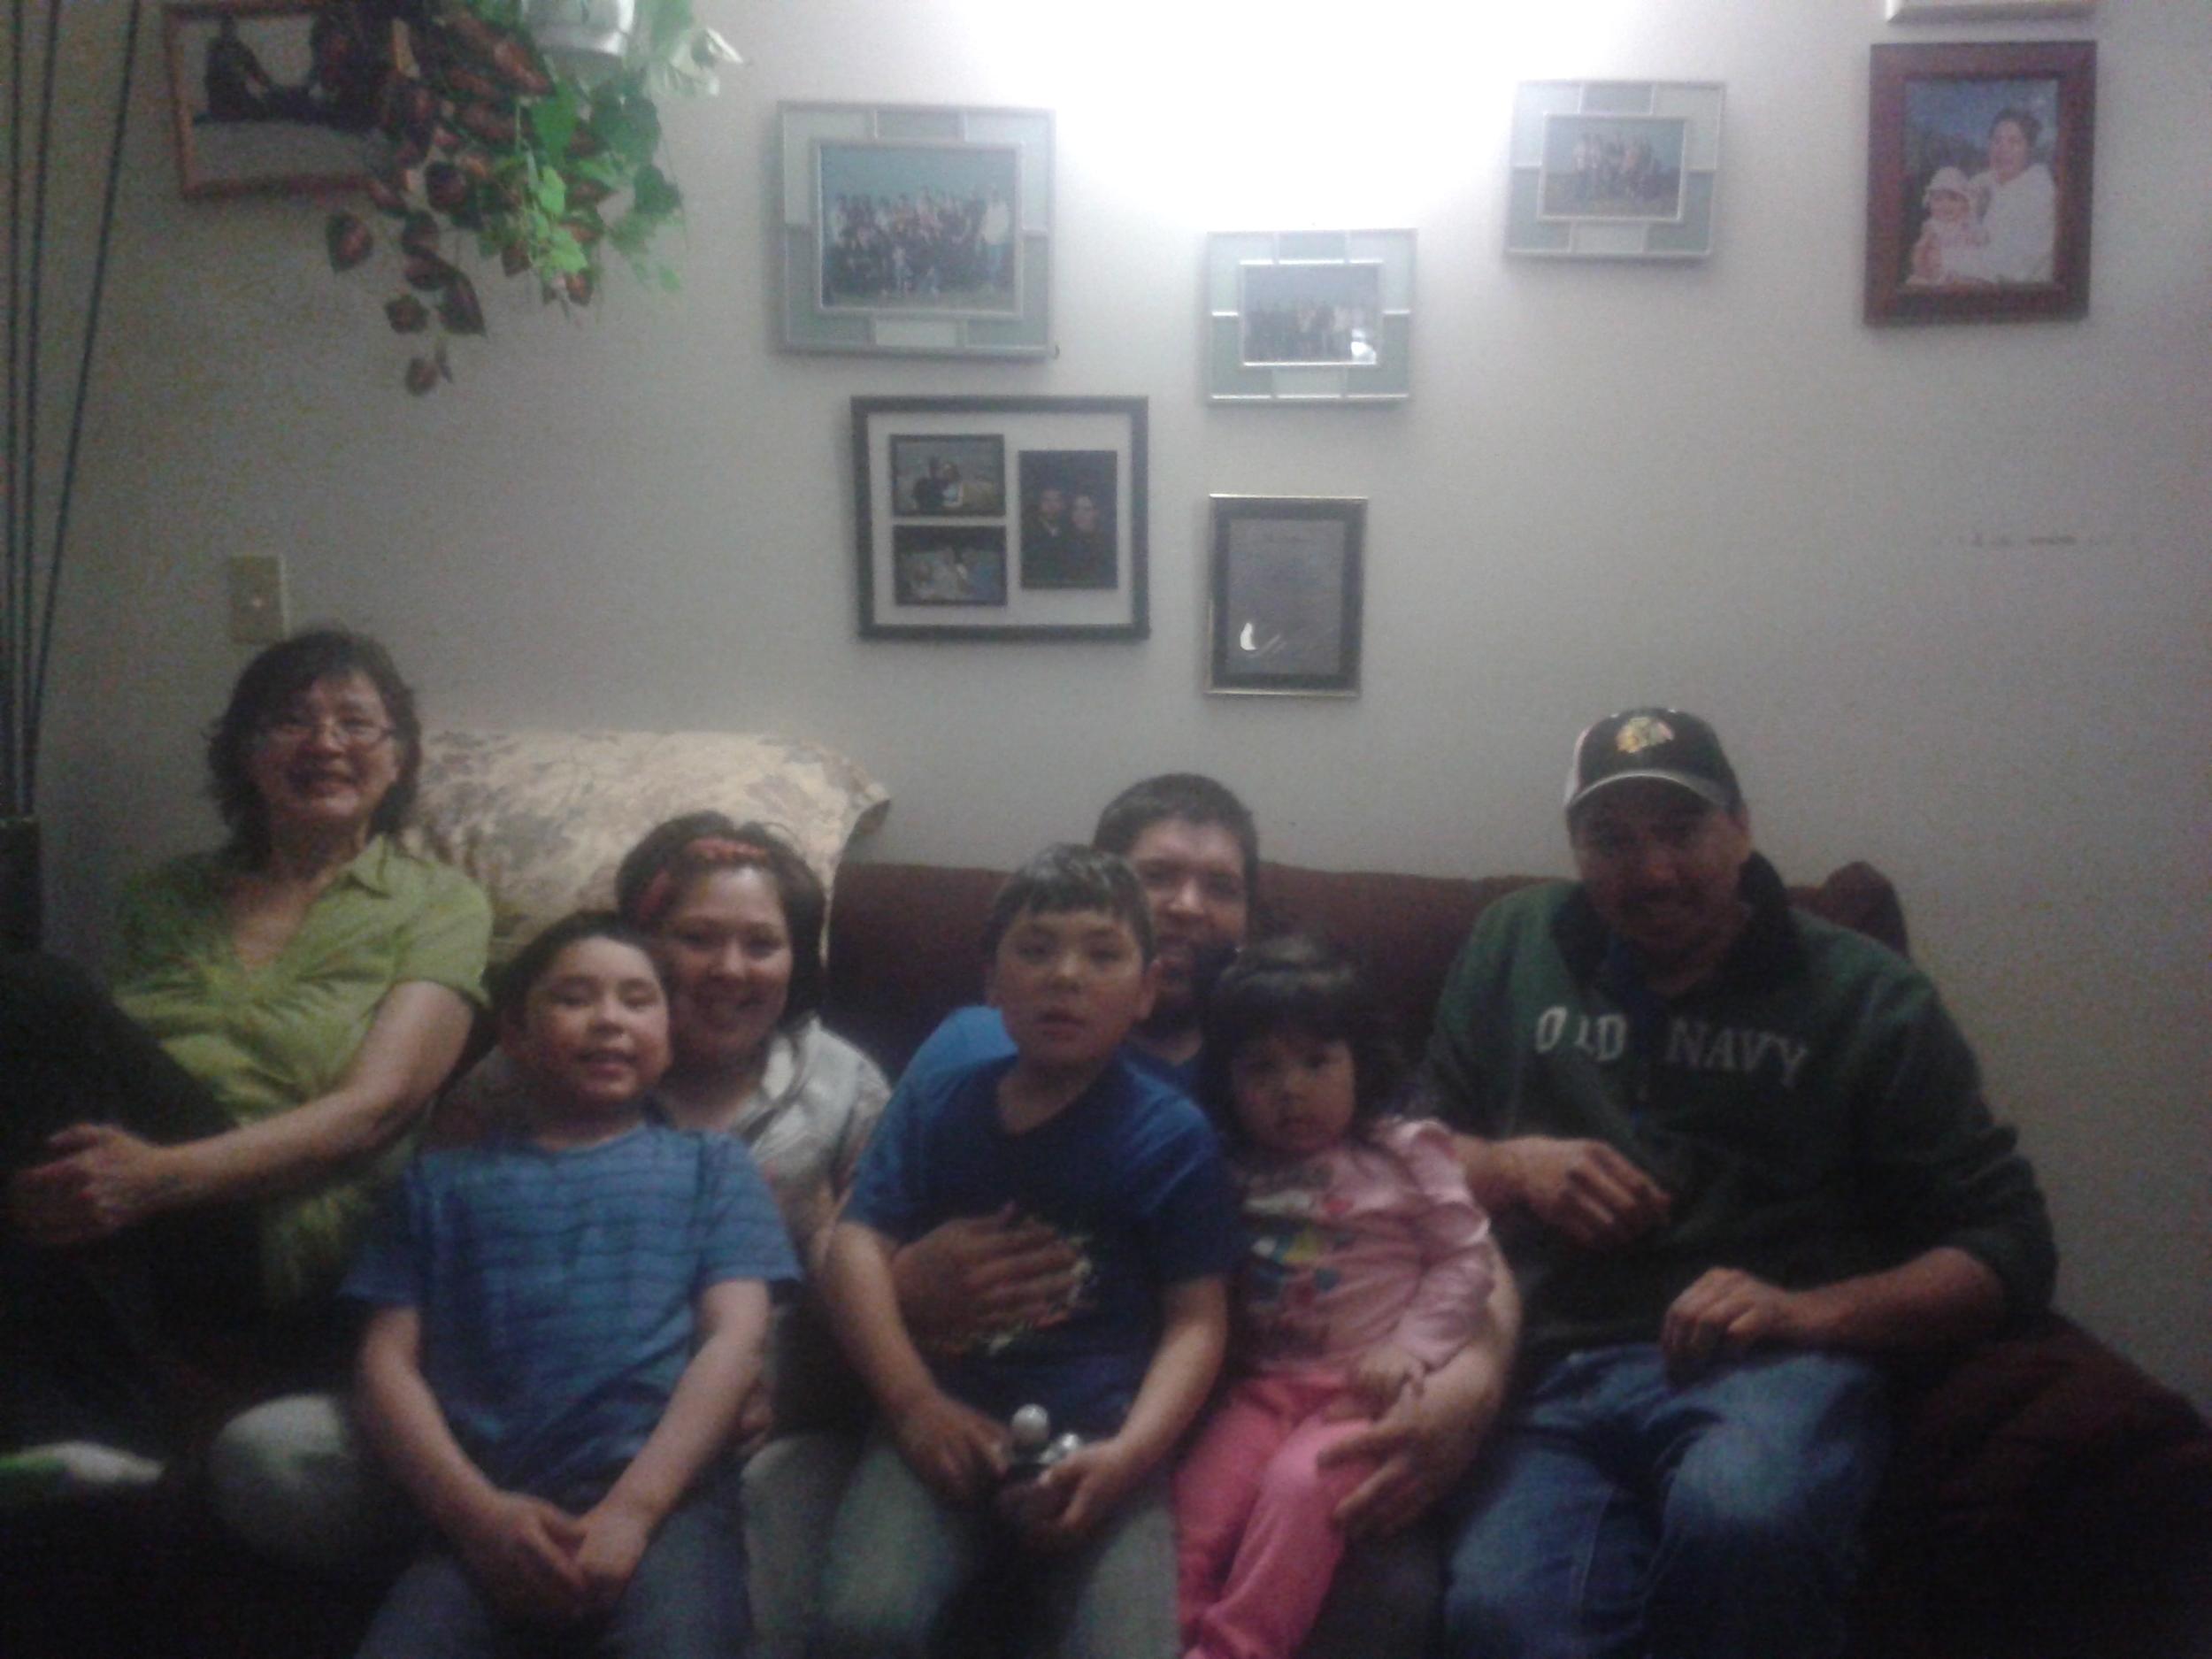 The Mcleod family